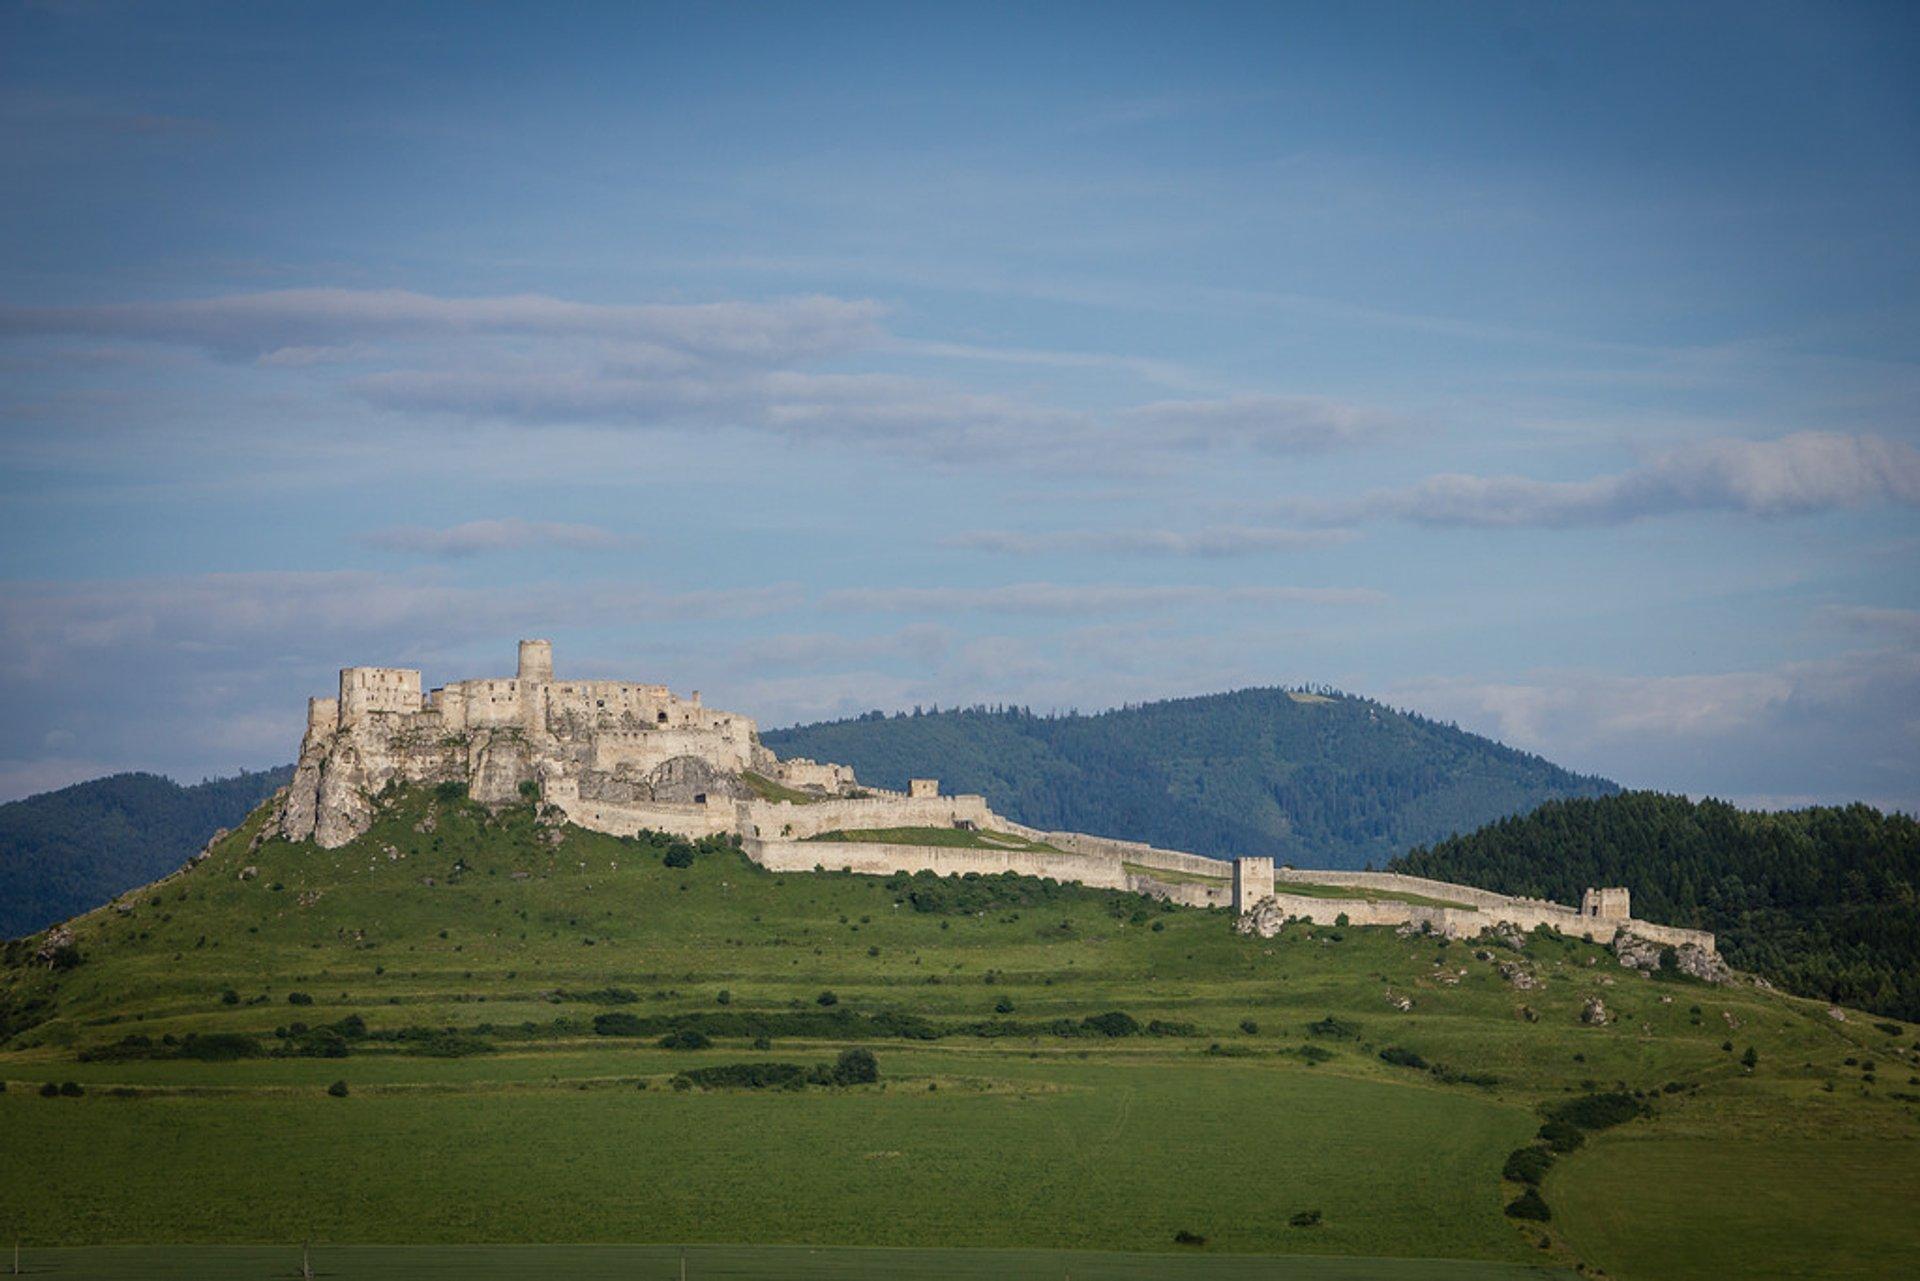 Spiš Castle in Slovakia 2020 - Best Time